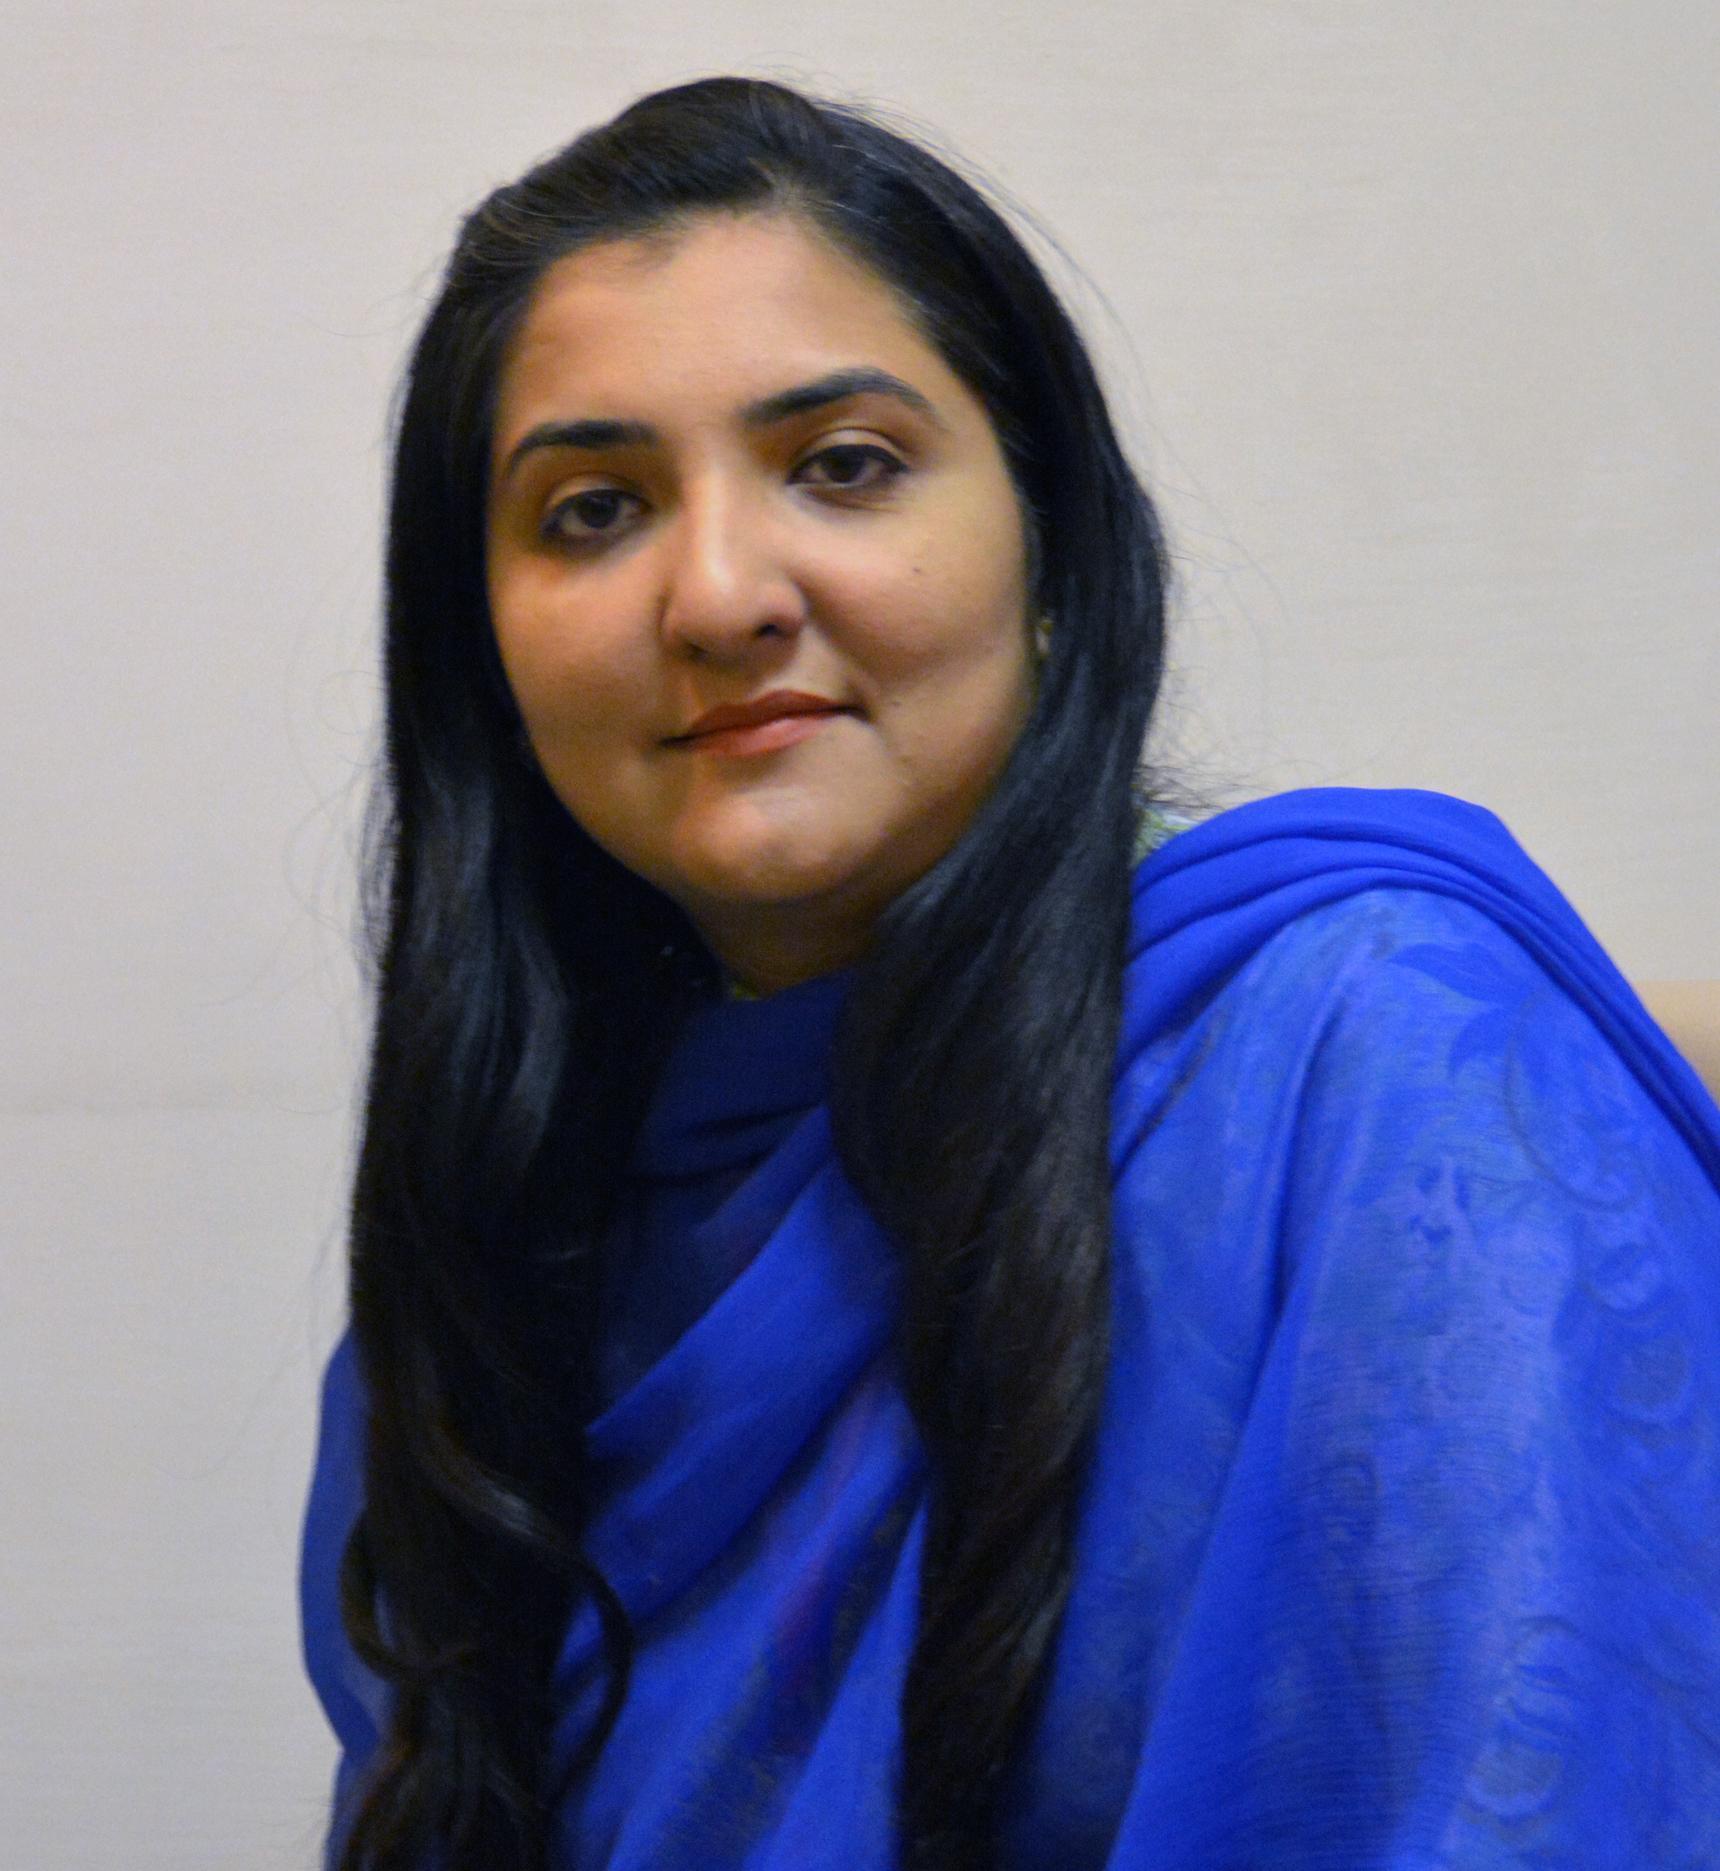 Ms. Durr-e-Shehwar (Assistant Professor)